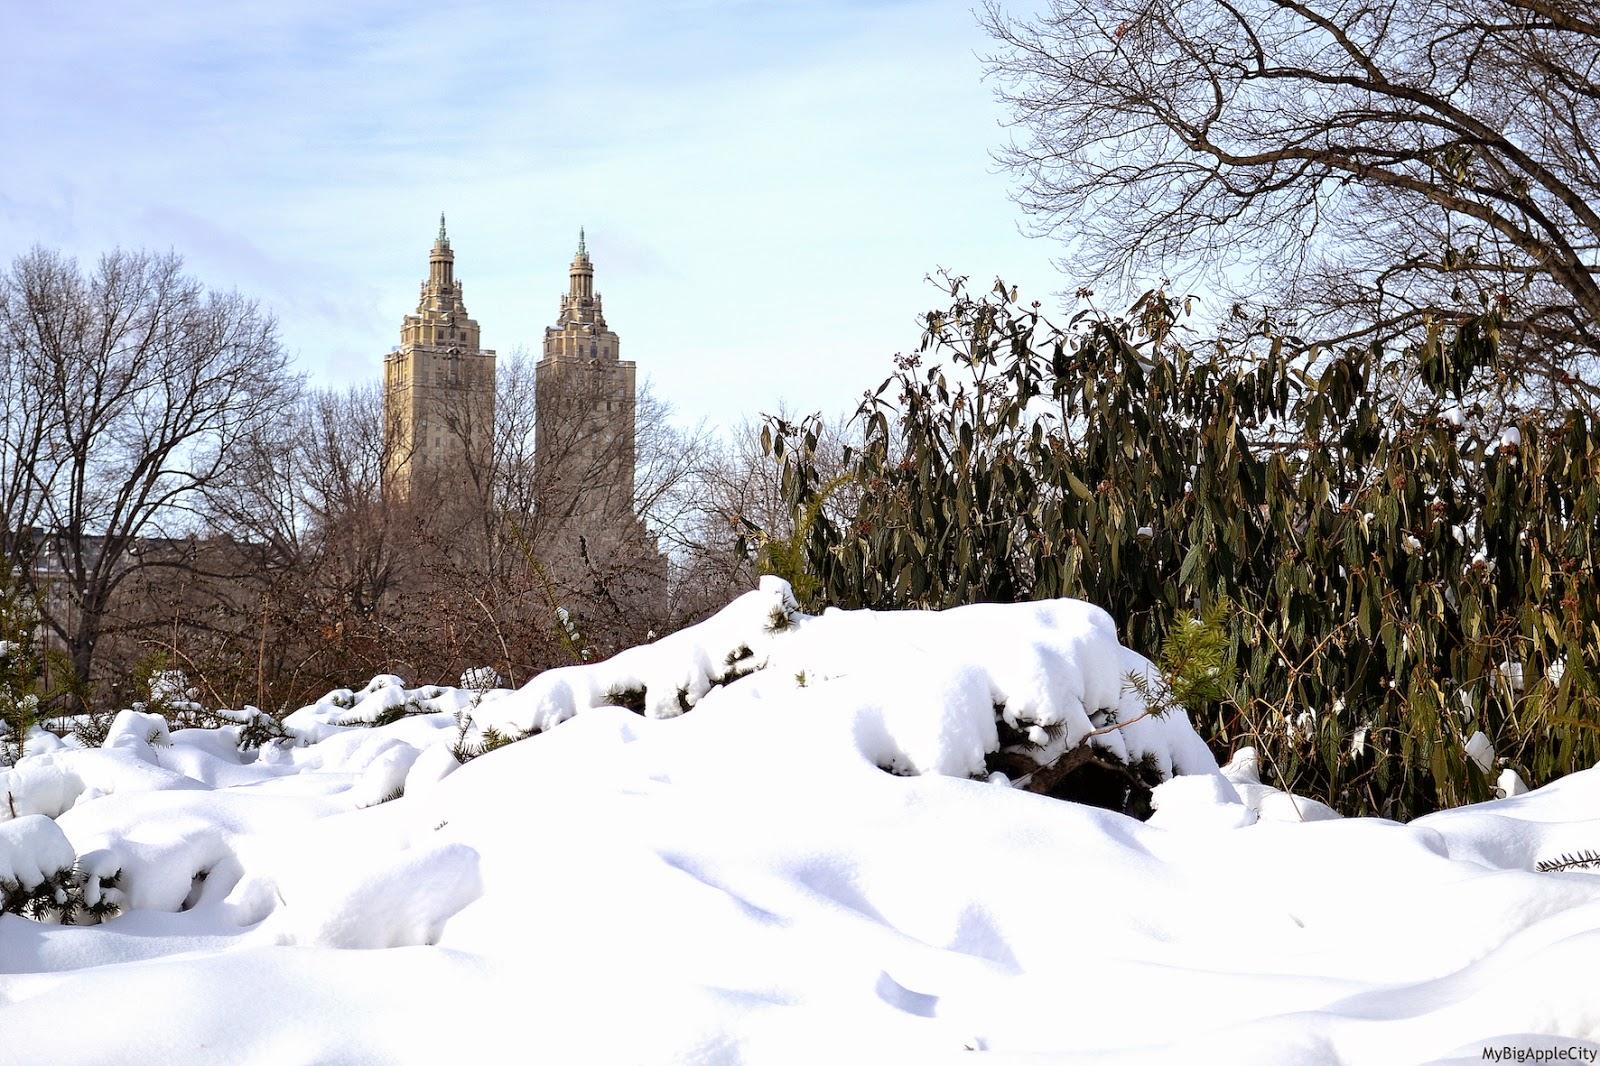 juno-2015-NYC-Blizzard-central-park-winter